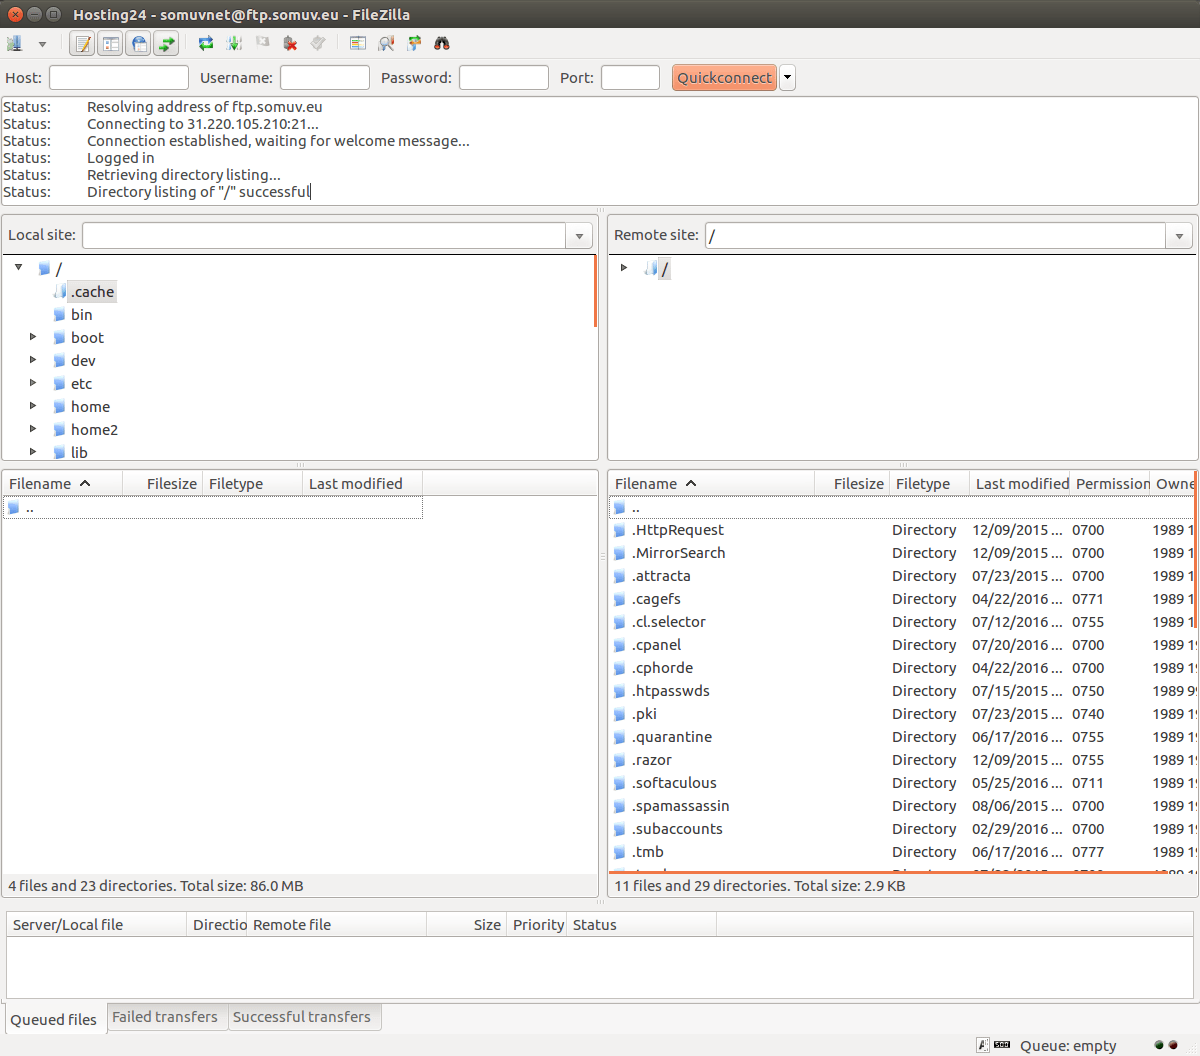 FileZilla FTP client connection successful